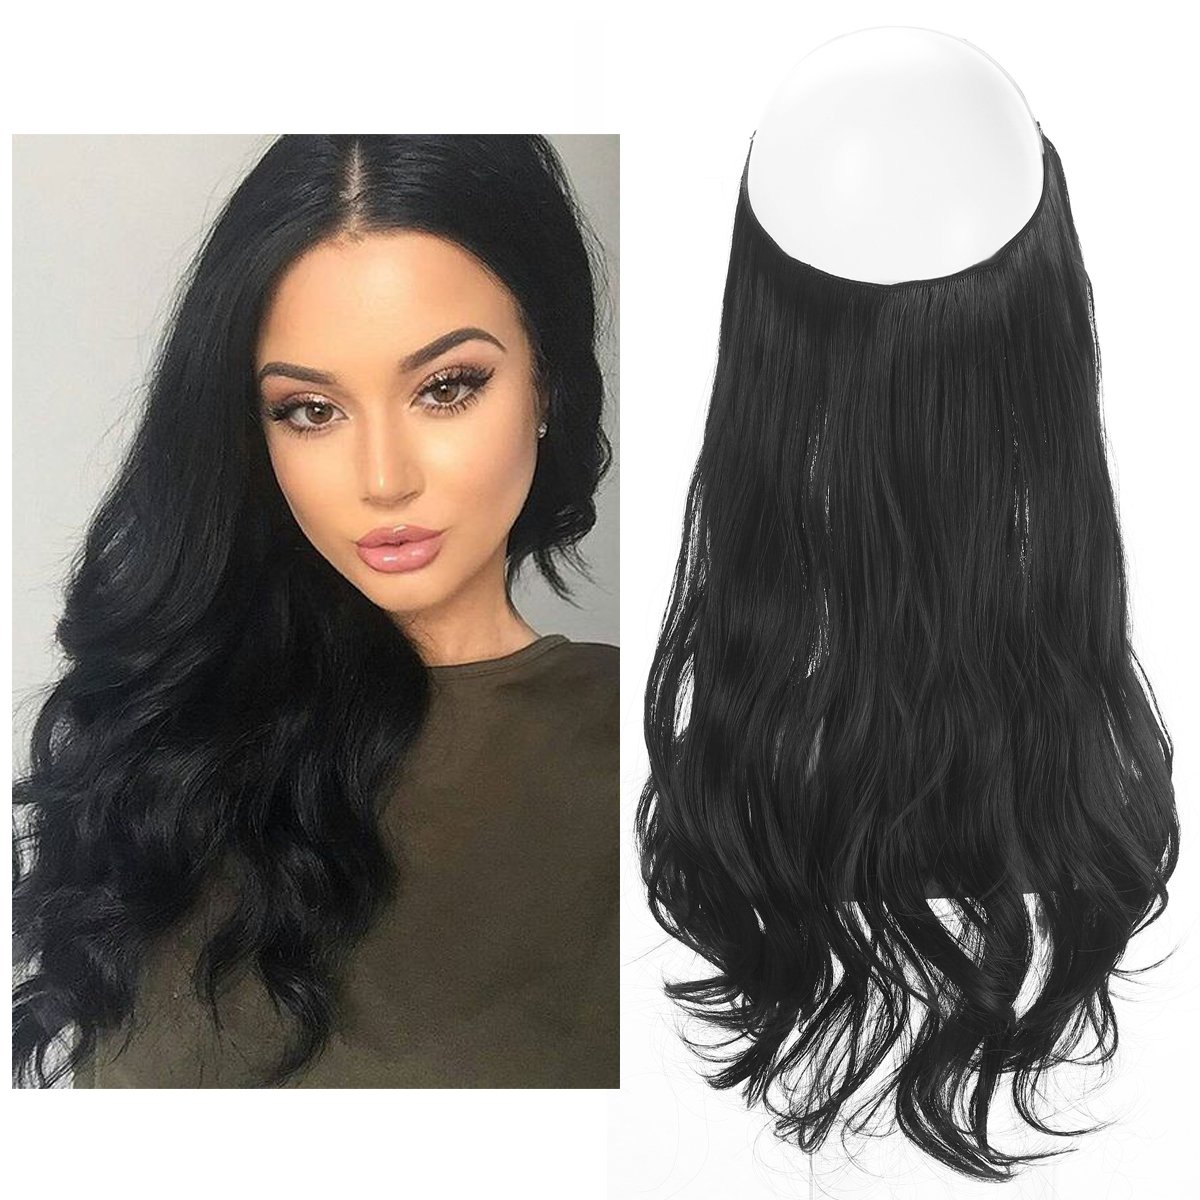 "Black Hair Extension No Clip in Halo Hairpiece Long Secret Natural Wavy Synthetic Hair Pieces For Women Flip Hidden Wire Crown Headband Japan Heat Temperature Fiber SARLA 18"" 4.4oz M01&1B"